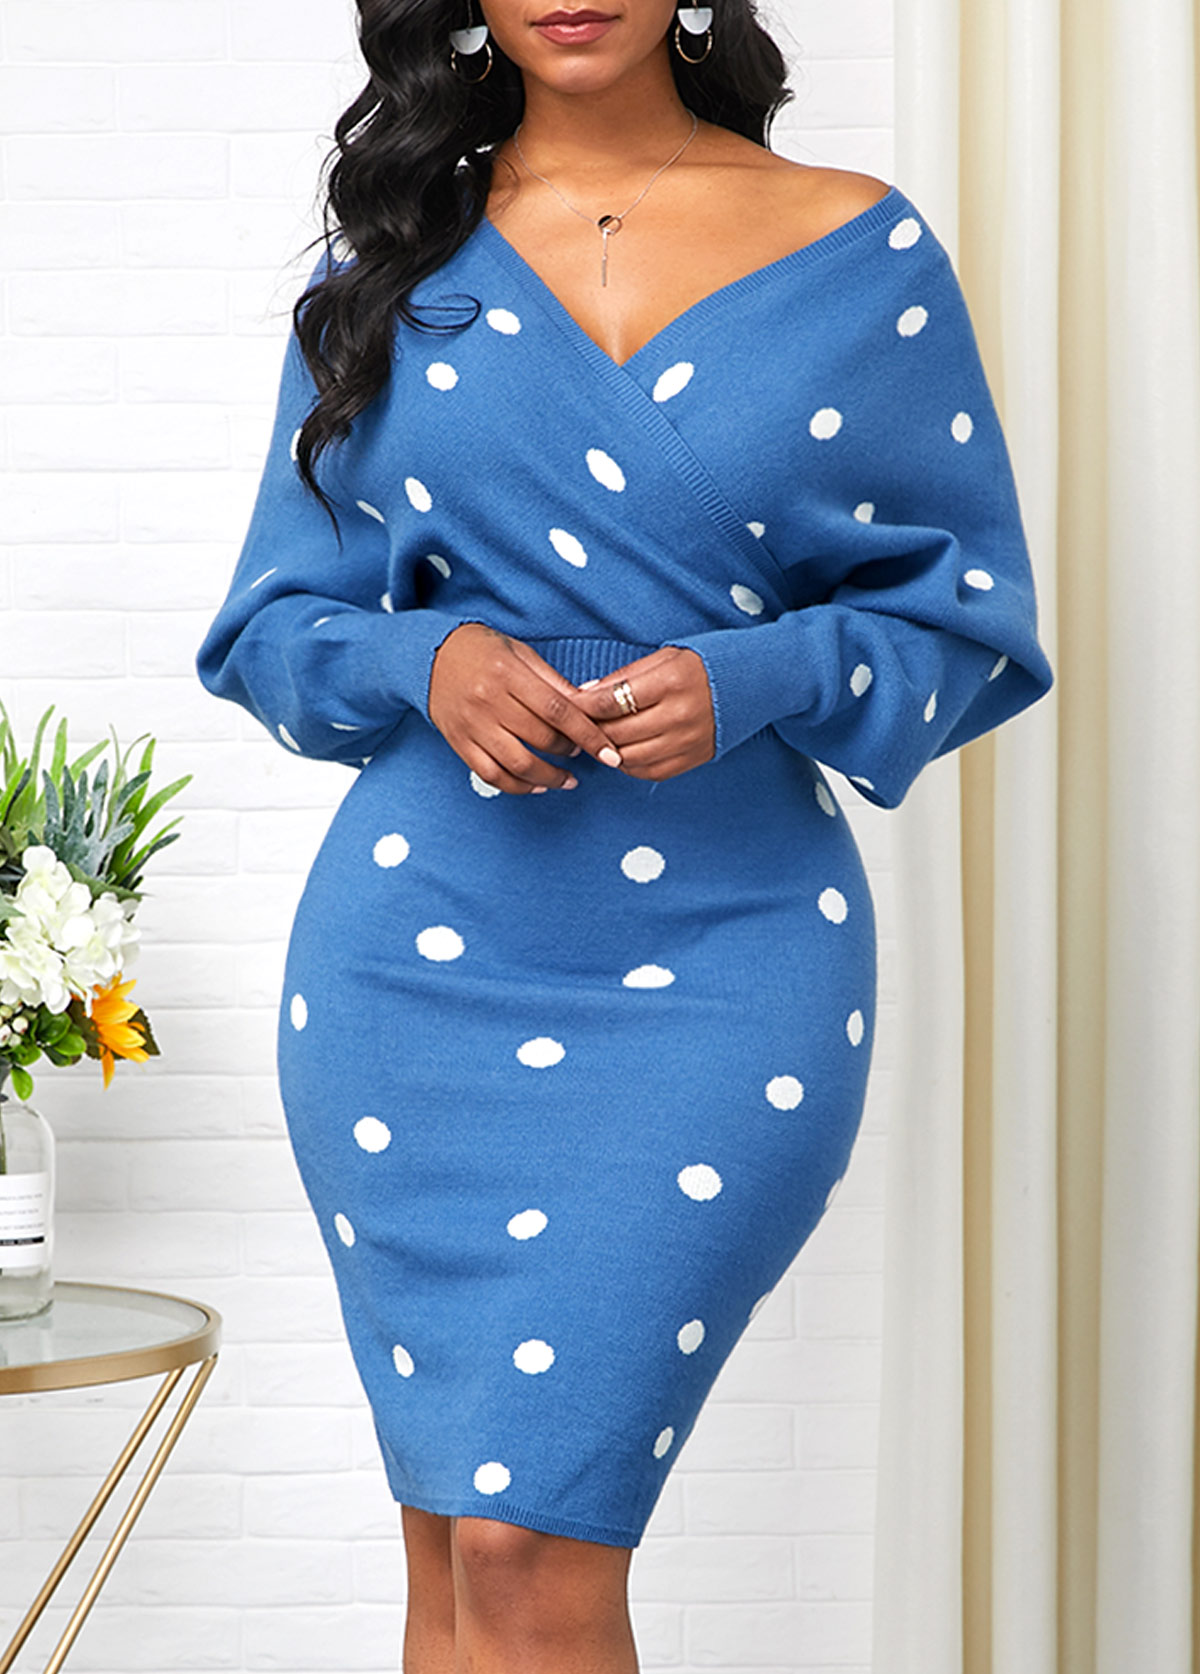 V Neck Blue Polka Dot Print Sweater Dress